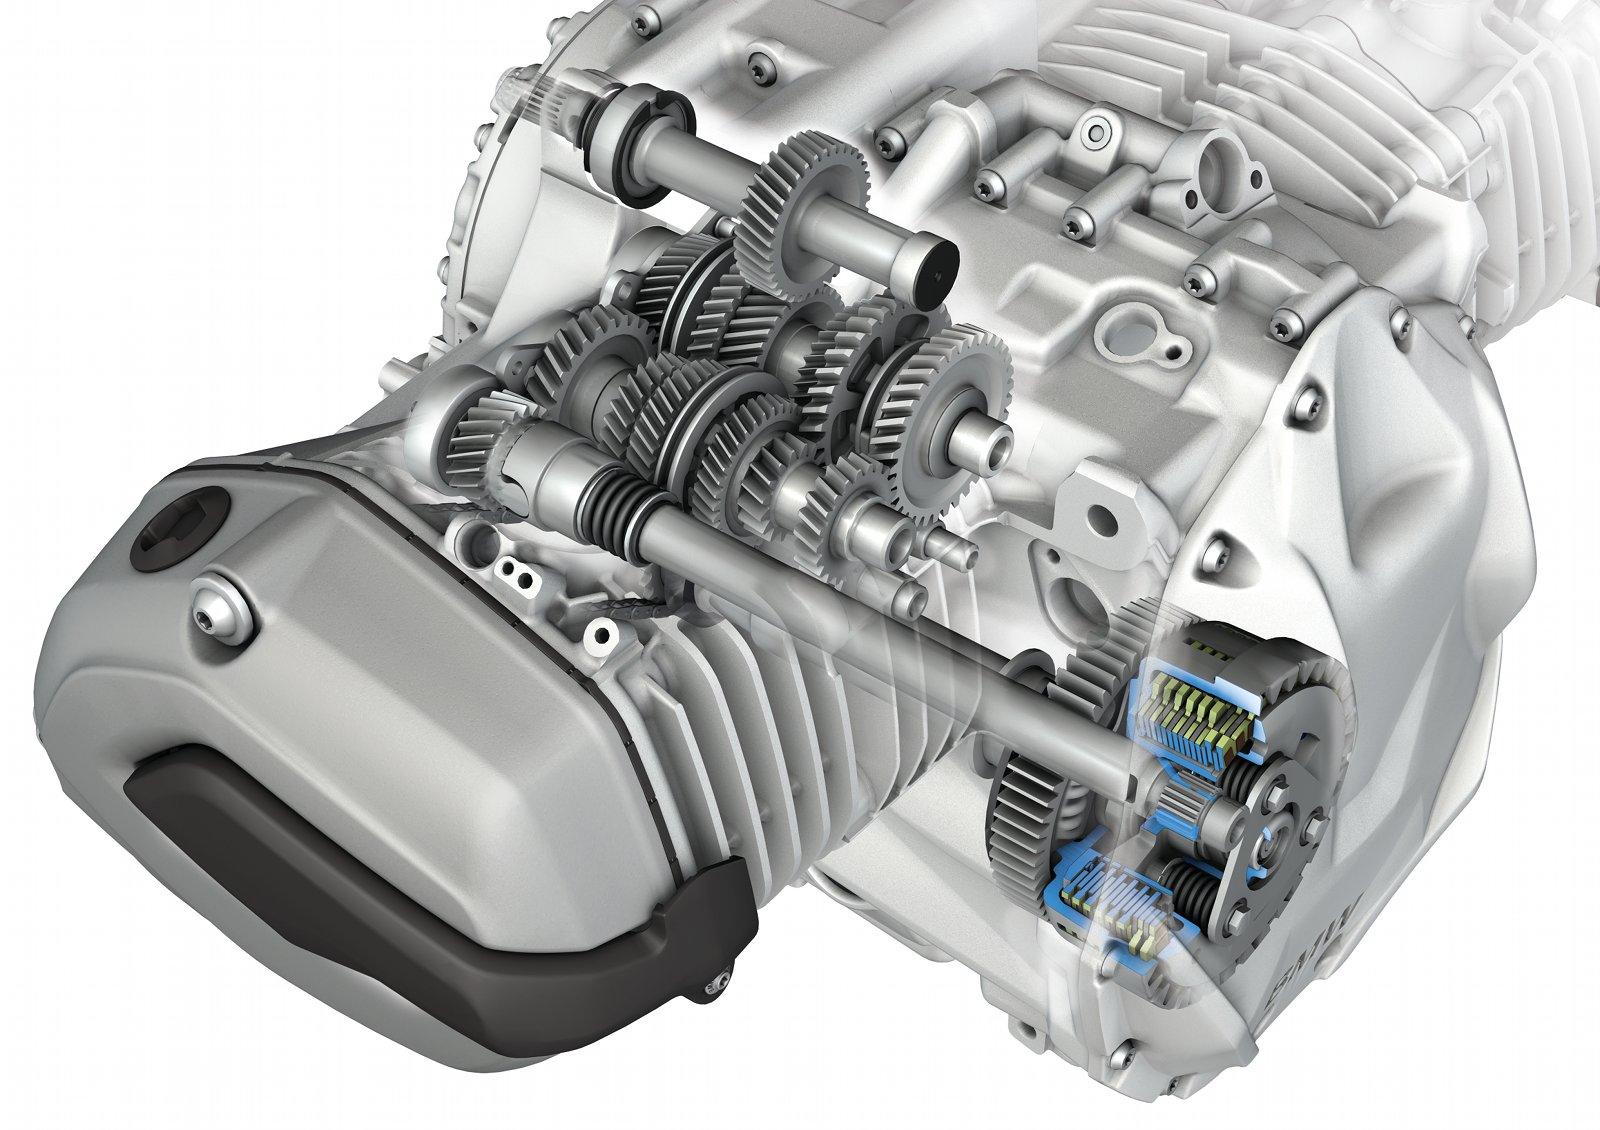 hight resolution of d e o honda rc51 parts diagram honda xl100 1977 usa carburetor bighu0035e4313 5ed6 also fig014 further likewise chry55 80 81 additionally kawasaki